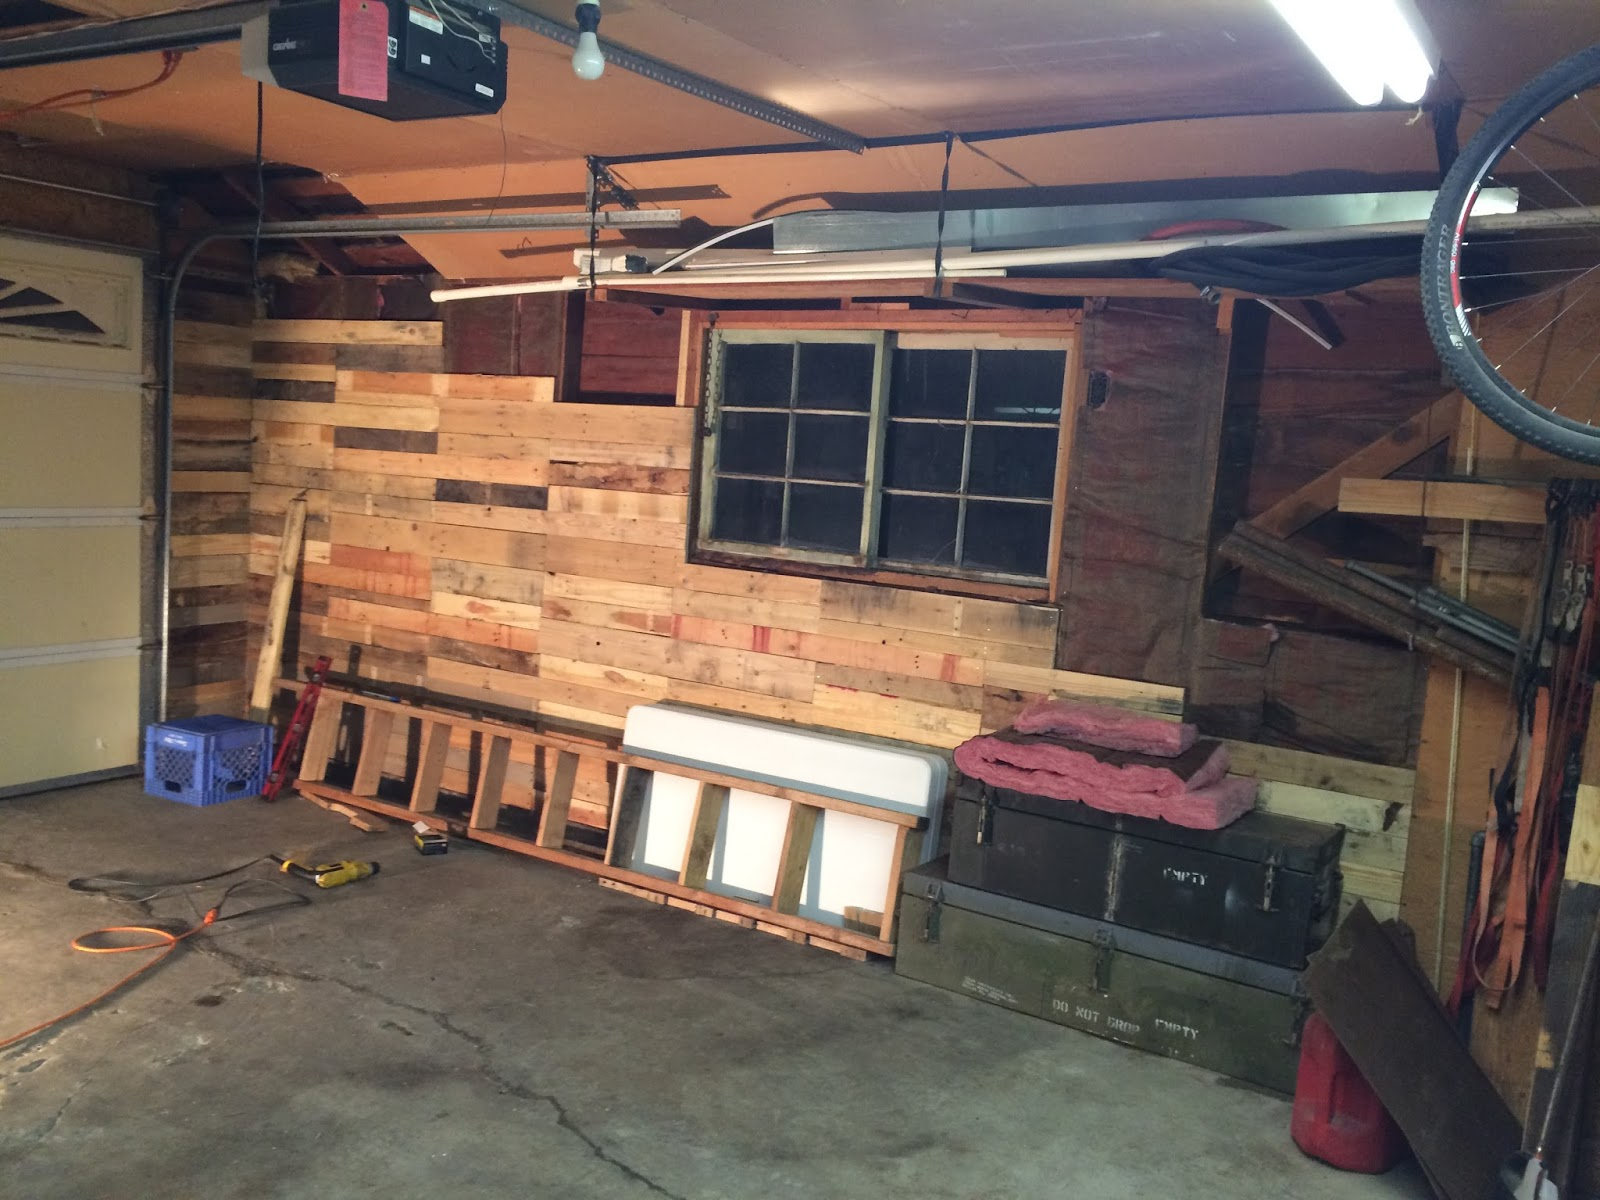 Carson's Blog: Garage Pallet Wood Wall Build (in progress)